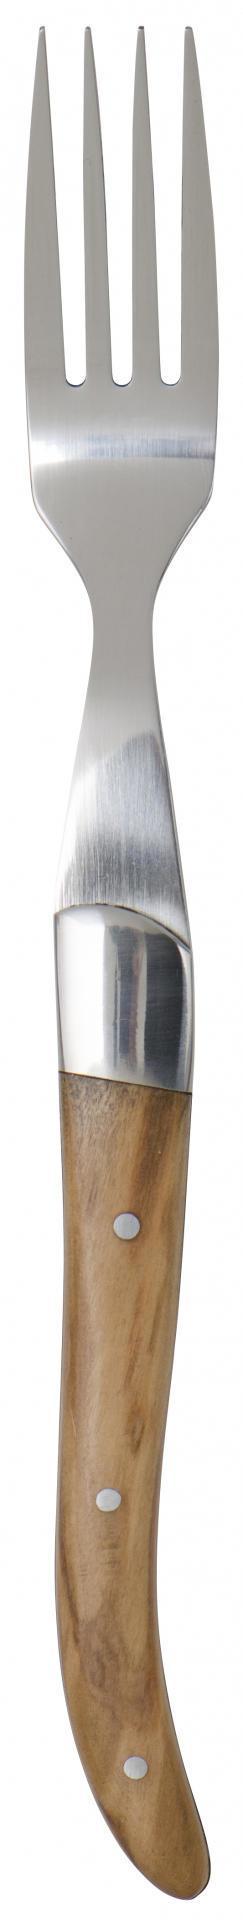 IB LAURSEN Steaková vidlička SKARP, hnědá barva, stříbrná barva, dřevo, kov